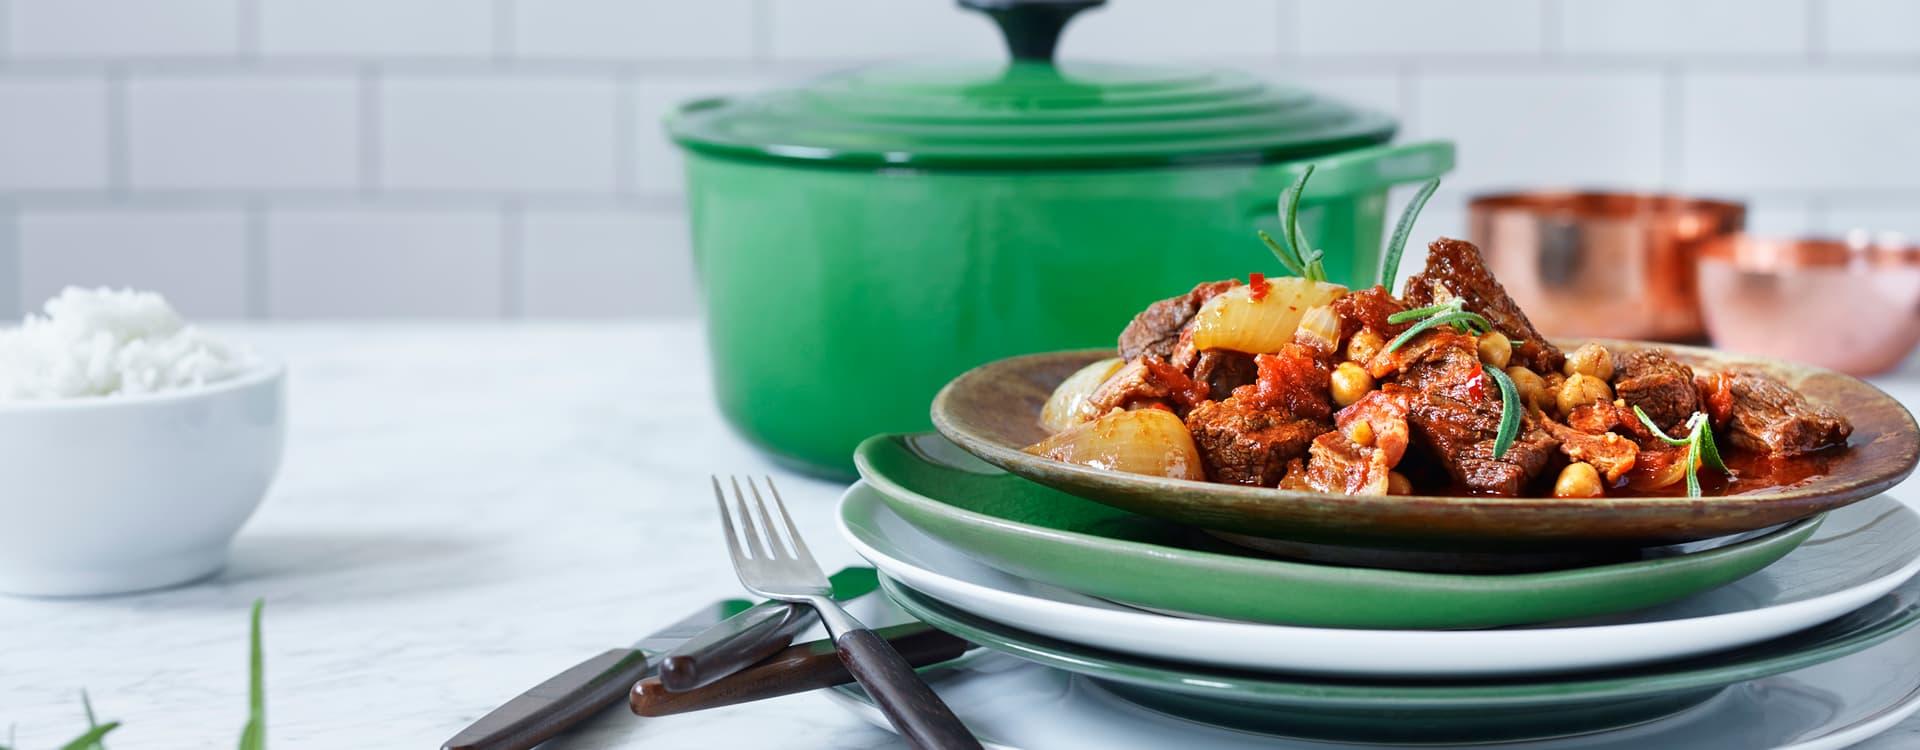 Krydret storfegryte med kikerter, chili og spisskummenyoghurt